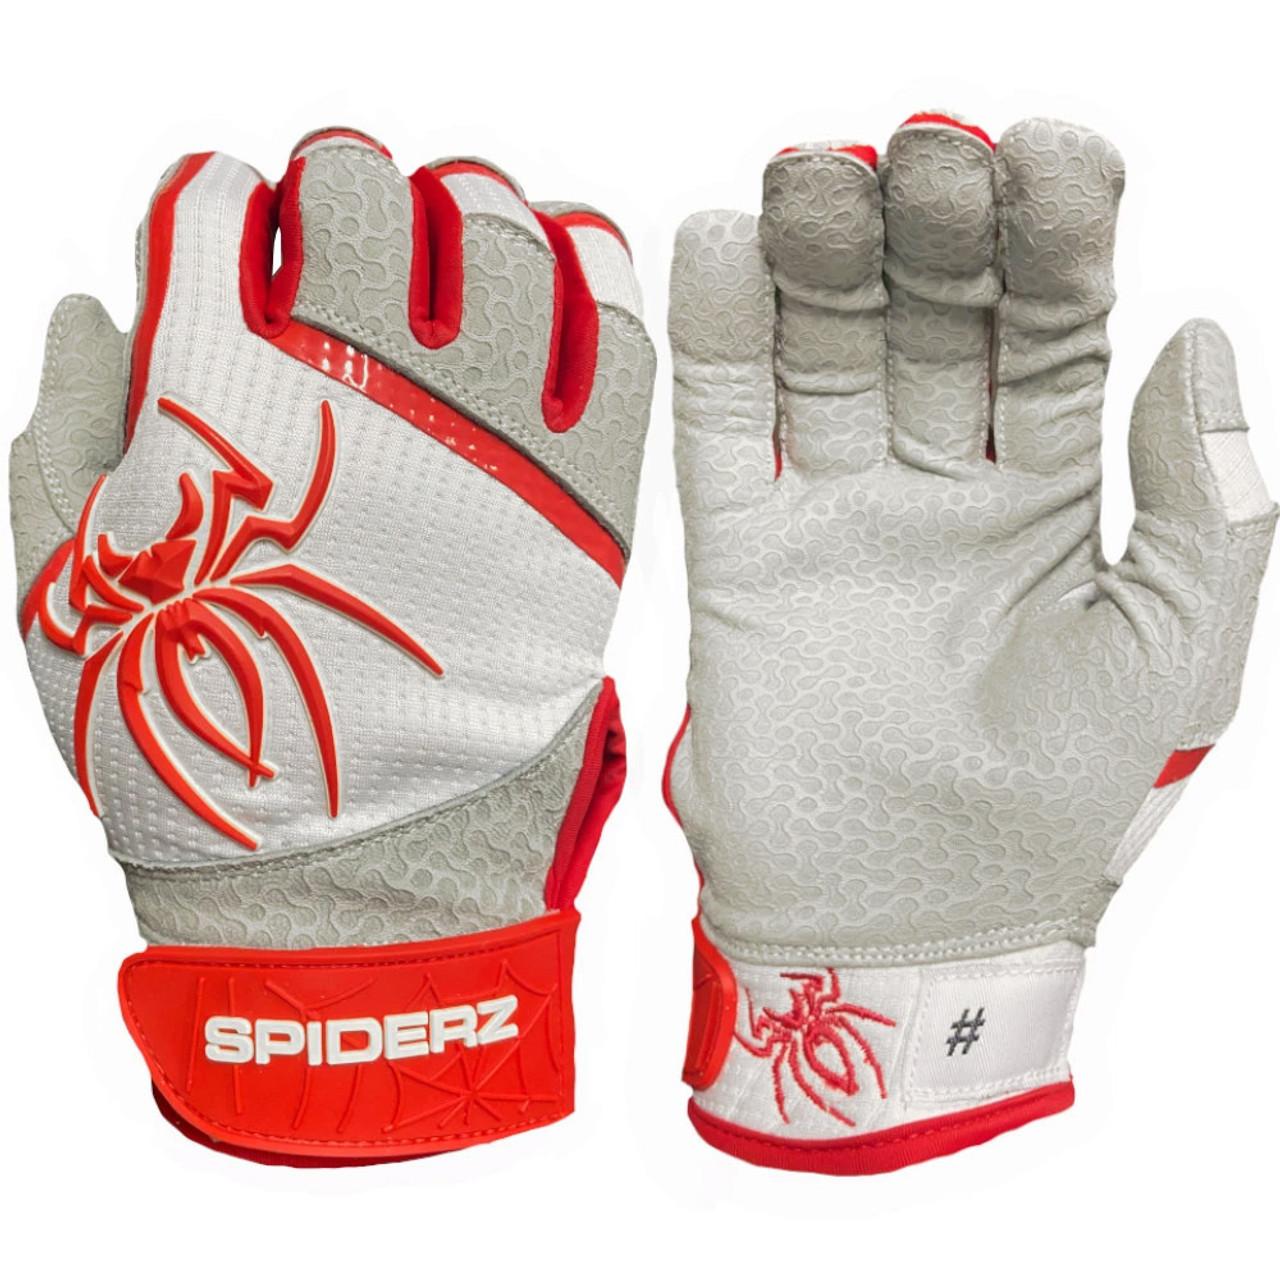 Large Red//White//Navy Spiderz 2021 Hybrid Baseball//Softball Batting Gloves